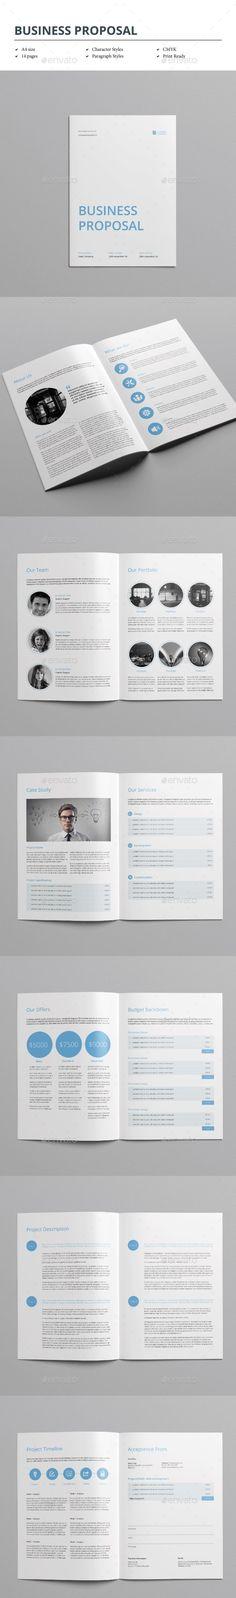 Questionnaire For Web Design  Proposal  Adobe Photoshop A